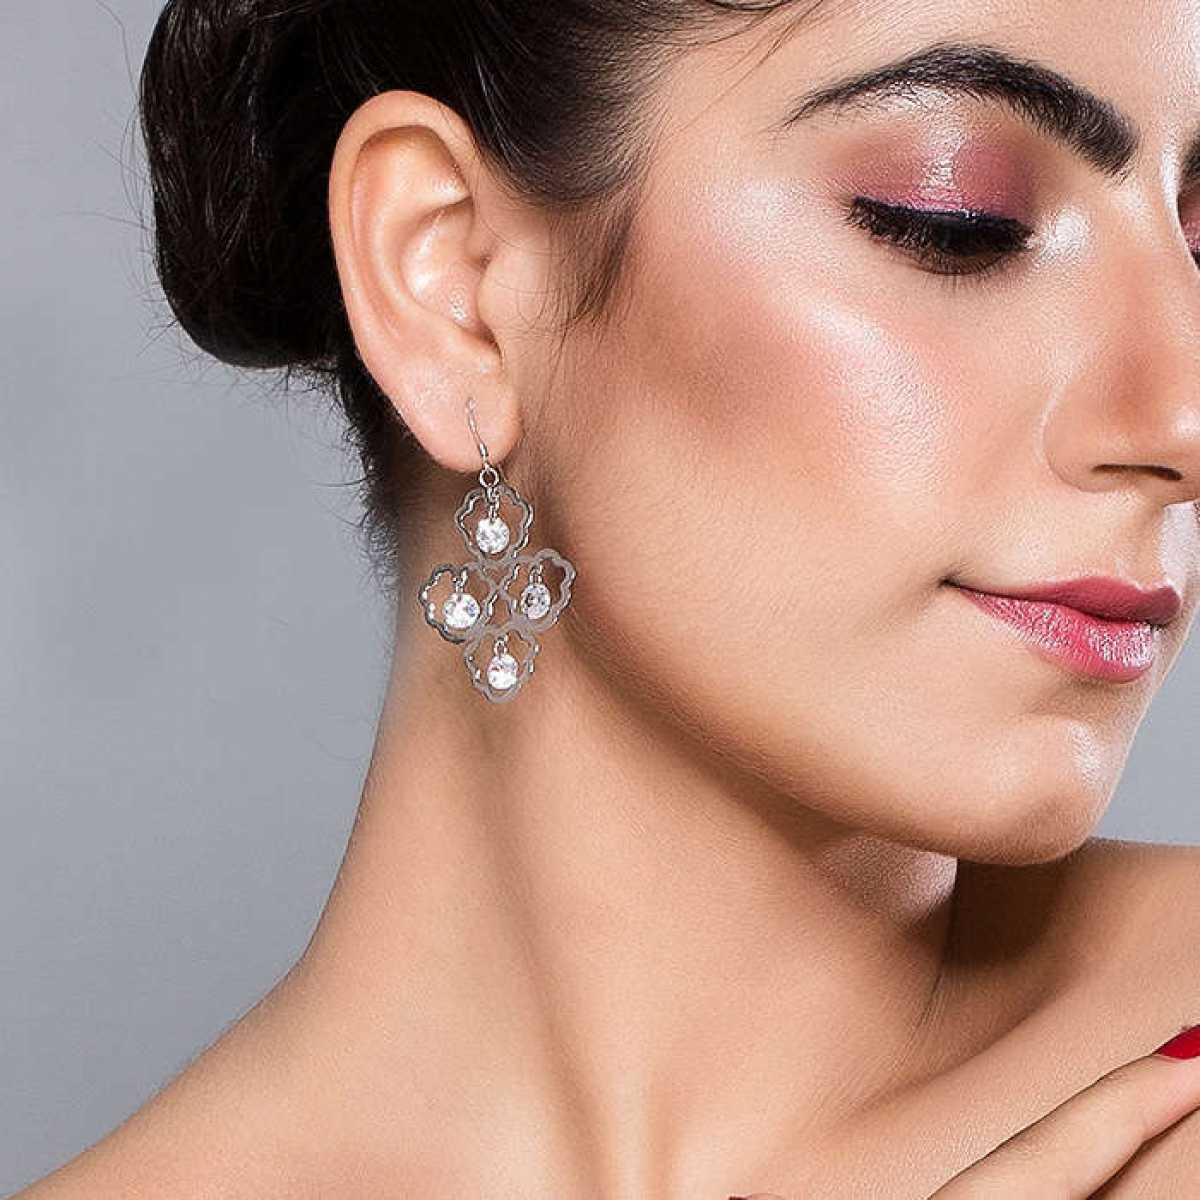 Delicate Silver Drop Earring With Diamond Earring